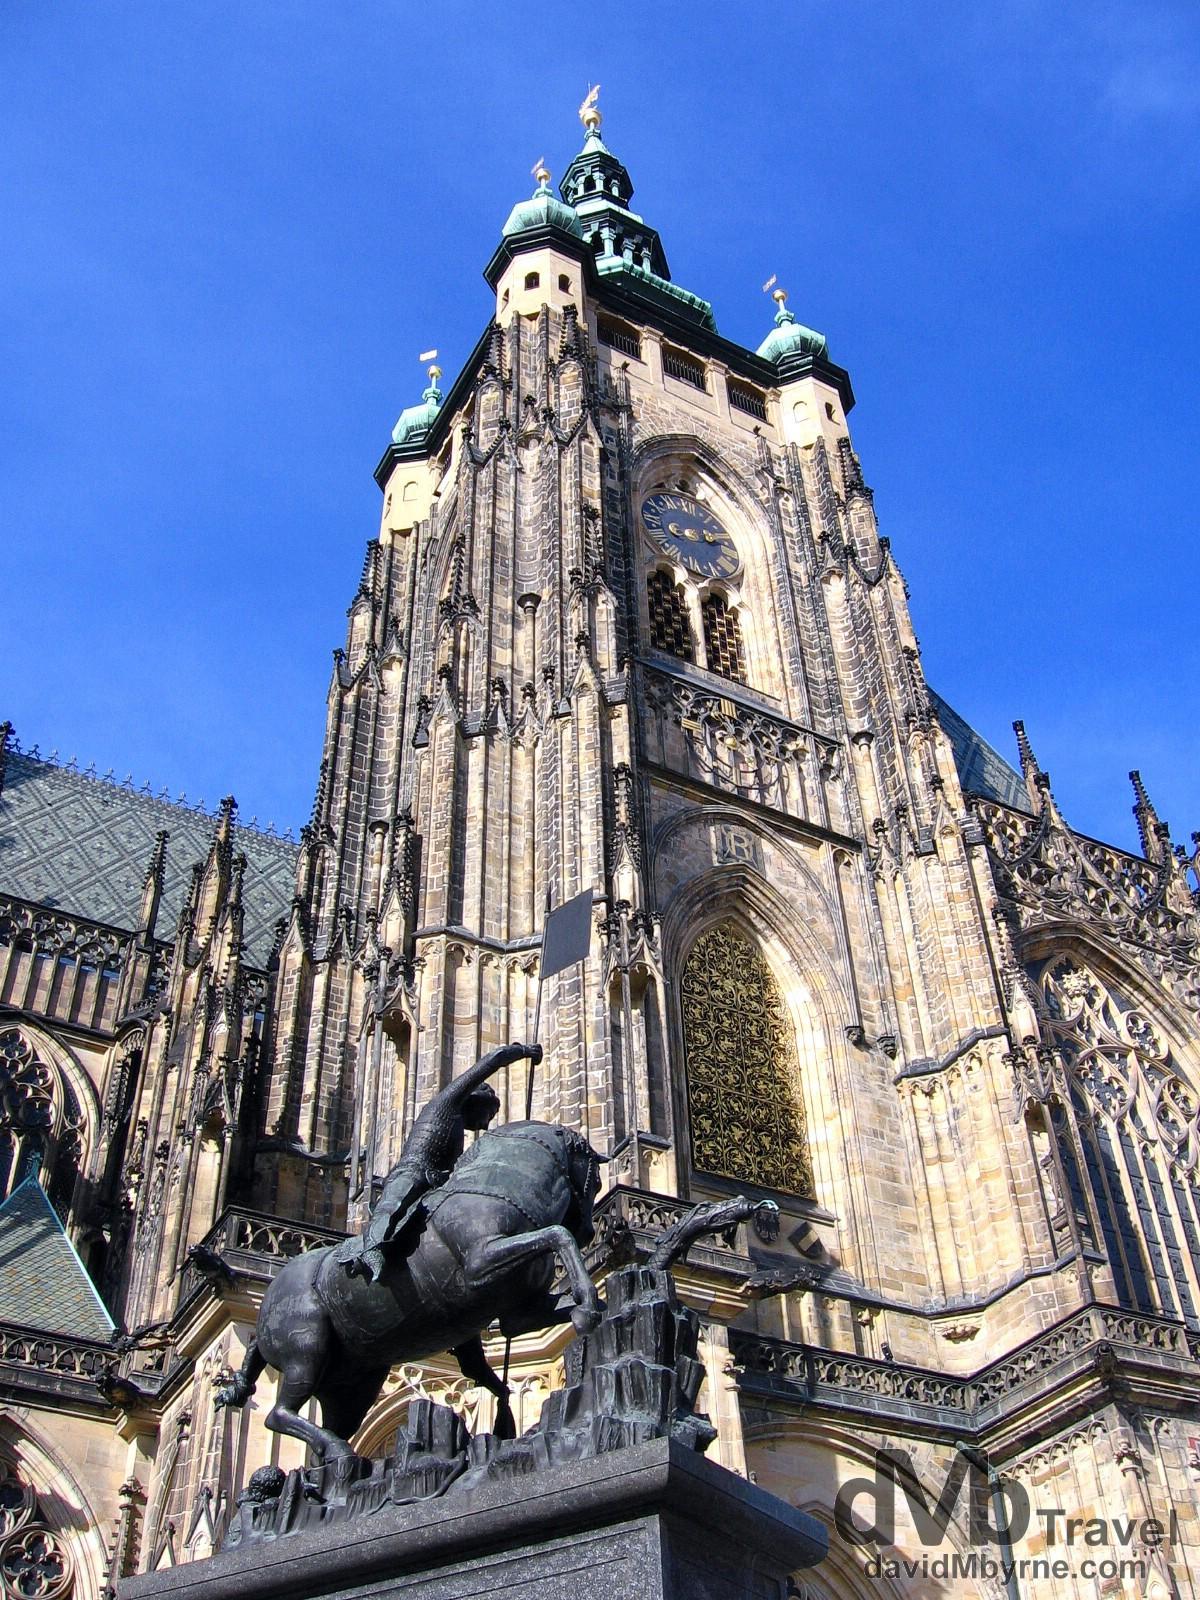 Saint Vitus Cathedral in the grounds of Prague Castle, Prague, Czech Republic. March 8, 2006.